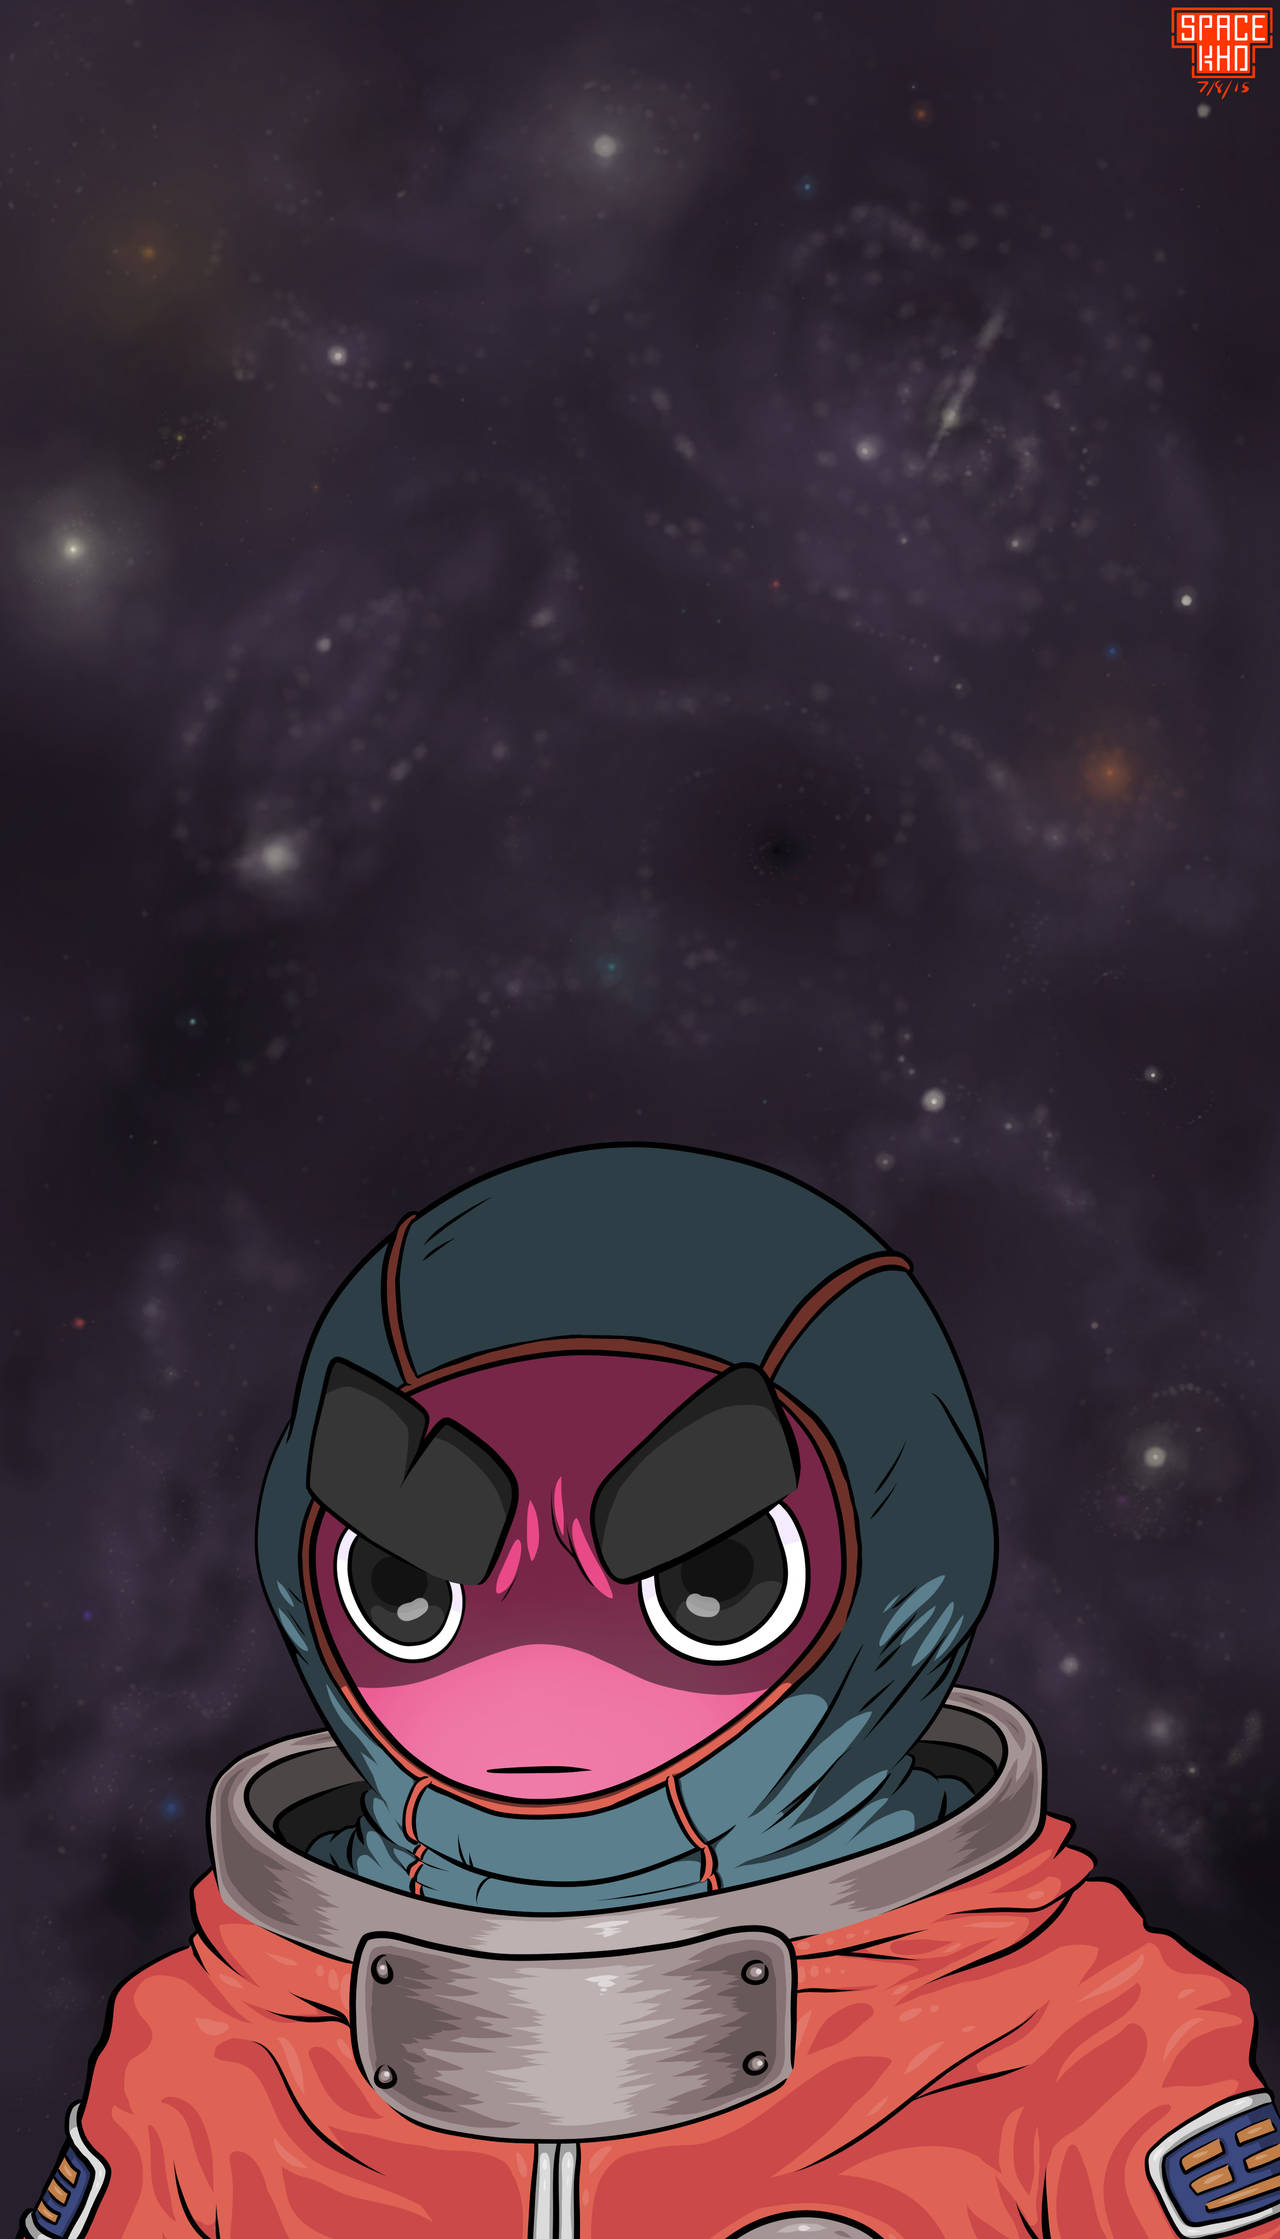 Space-khD's Profile Picture